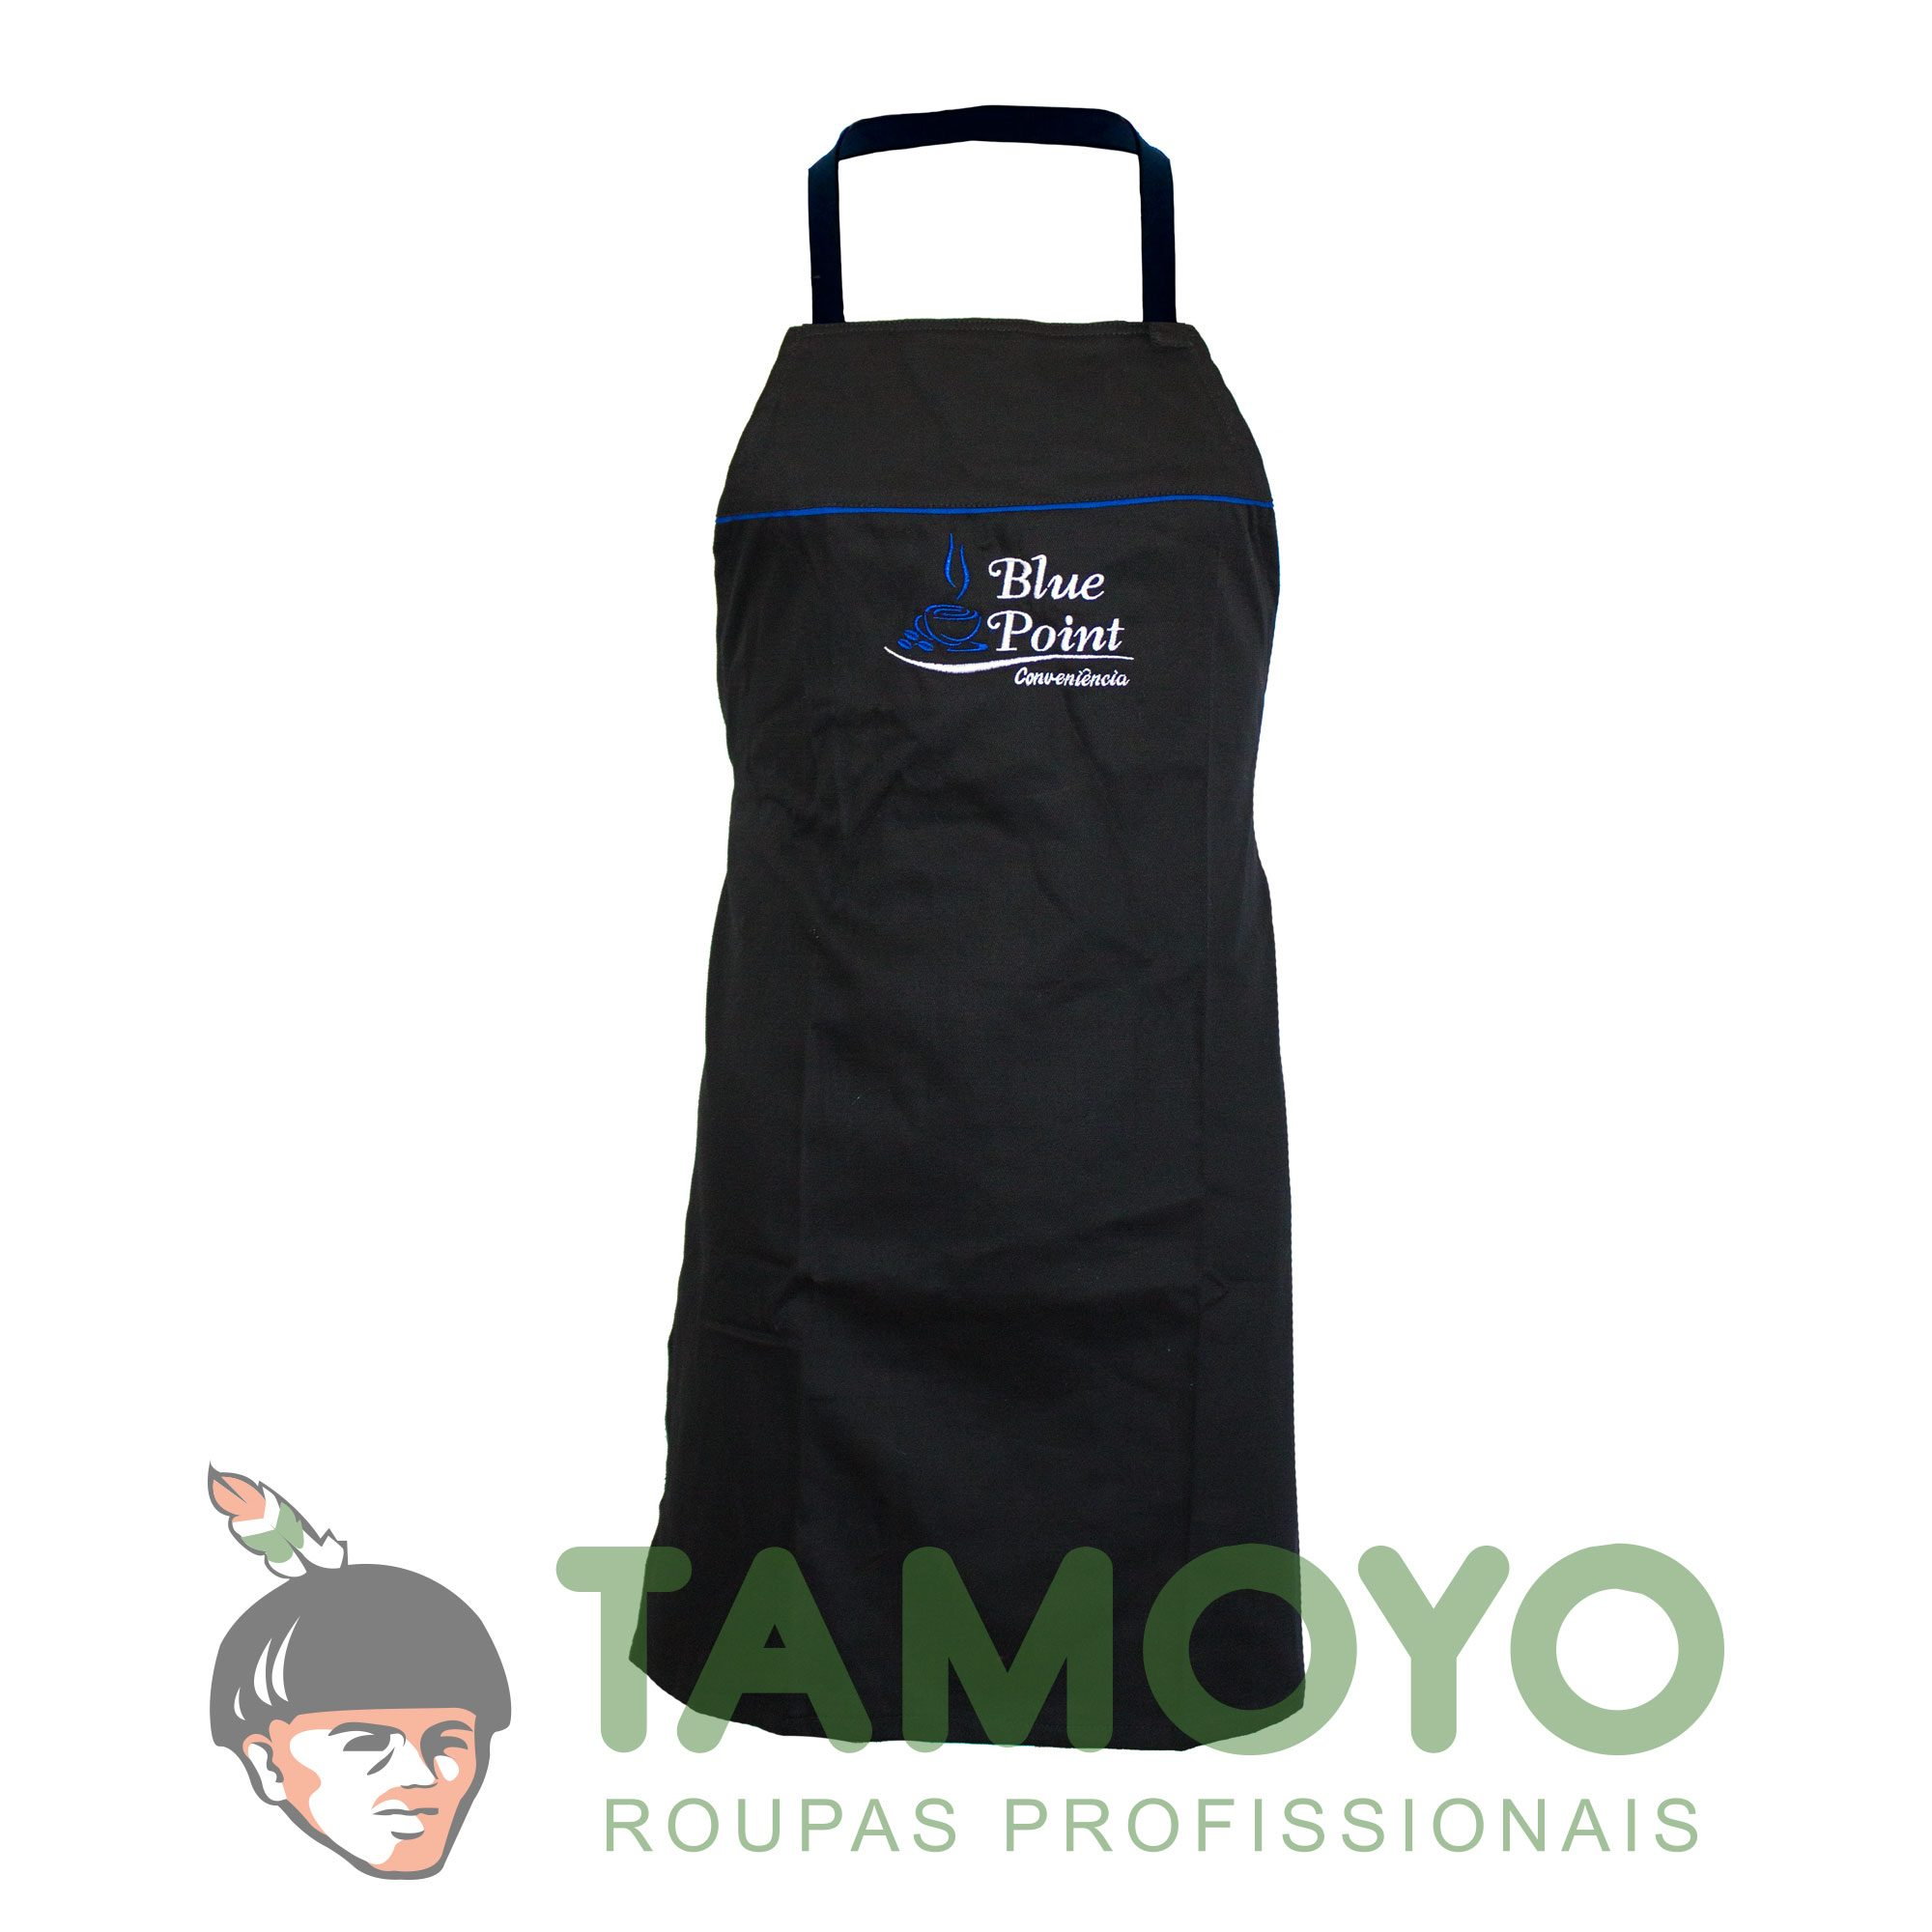 avental-boxter-roupas-tamoyo-uniformes-profissionais